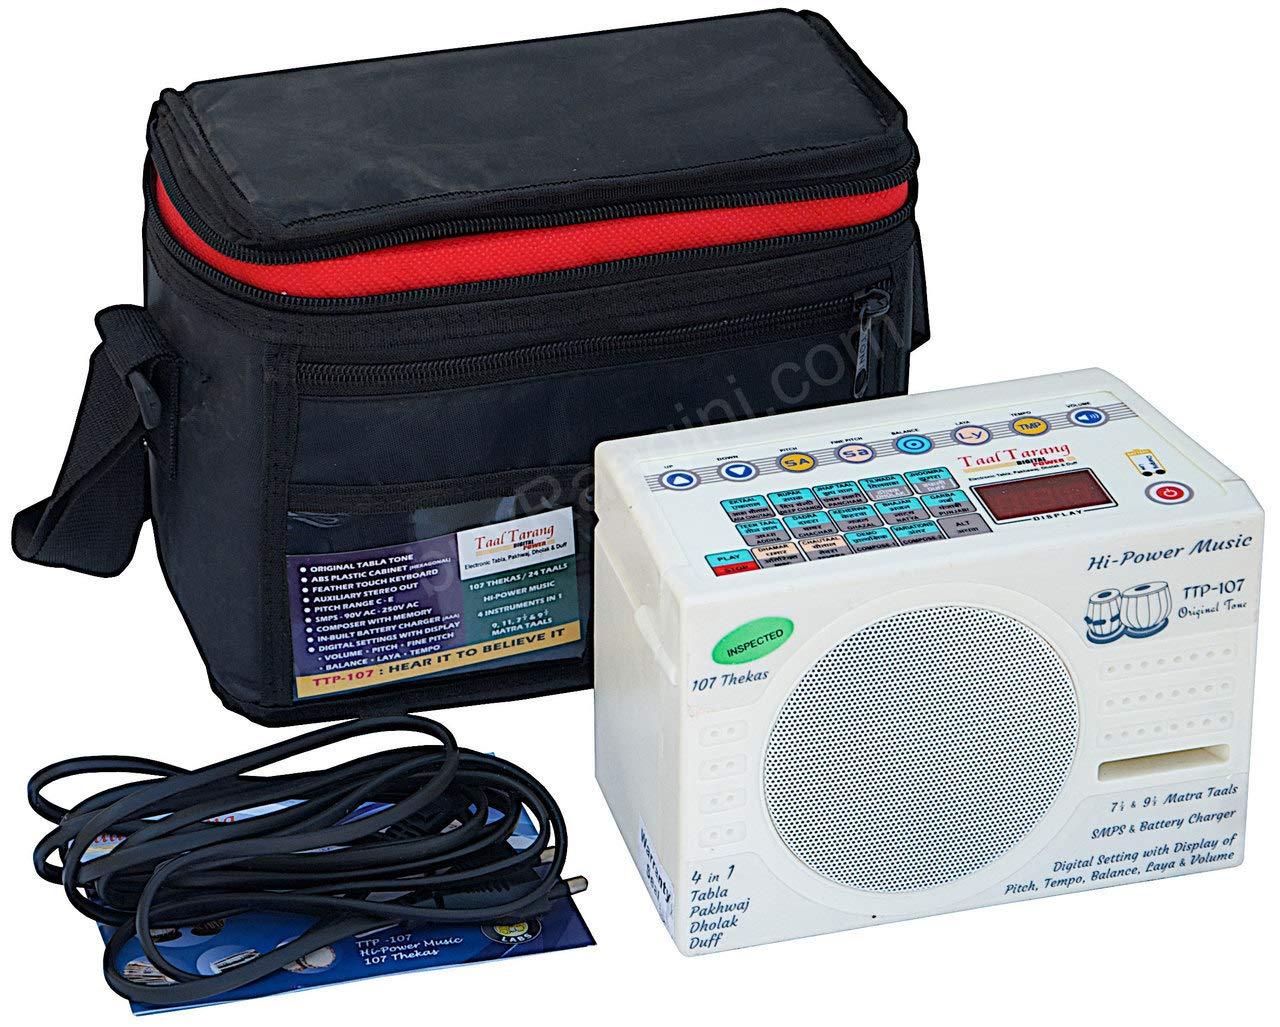 Electronic Tabla - Taal Tarang Digital Power Tabla Drum Kit, In USA, Electronic Tabla Machine by Sound Labs, Tabla Sampler, With Bag, Instruction Manual, Power Cord (PDI-HC) by Sound Labs by buyRaagini.com